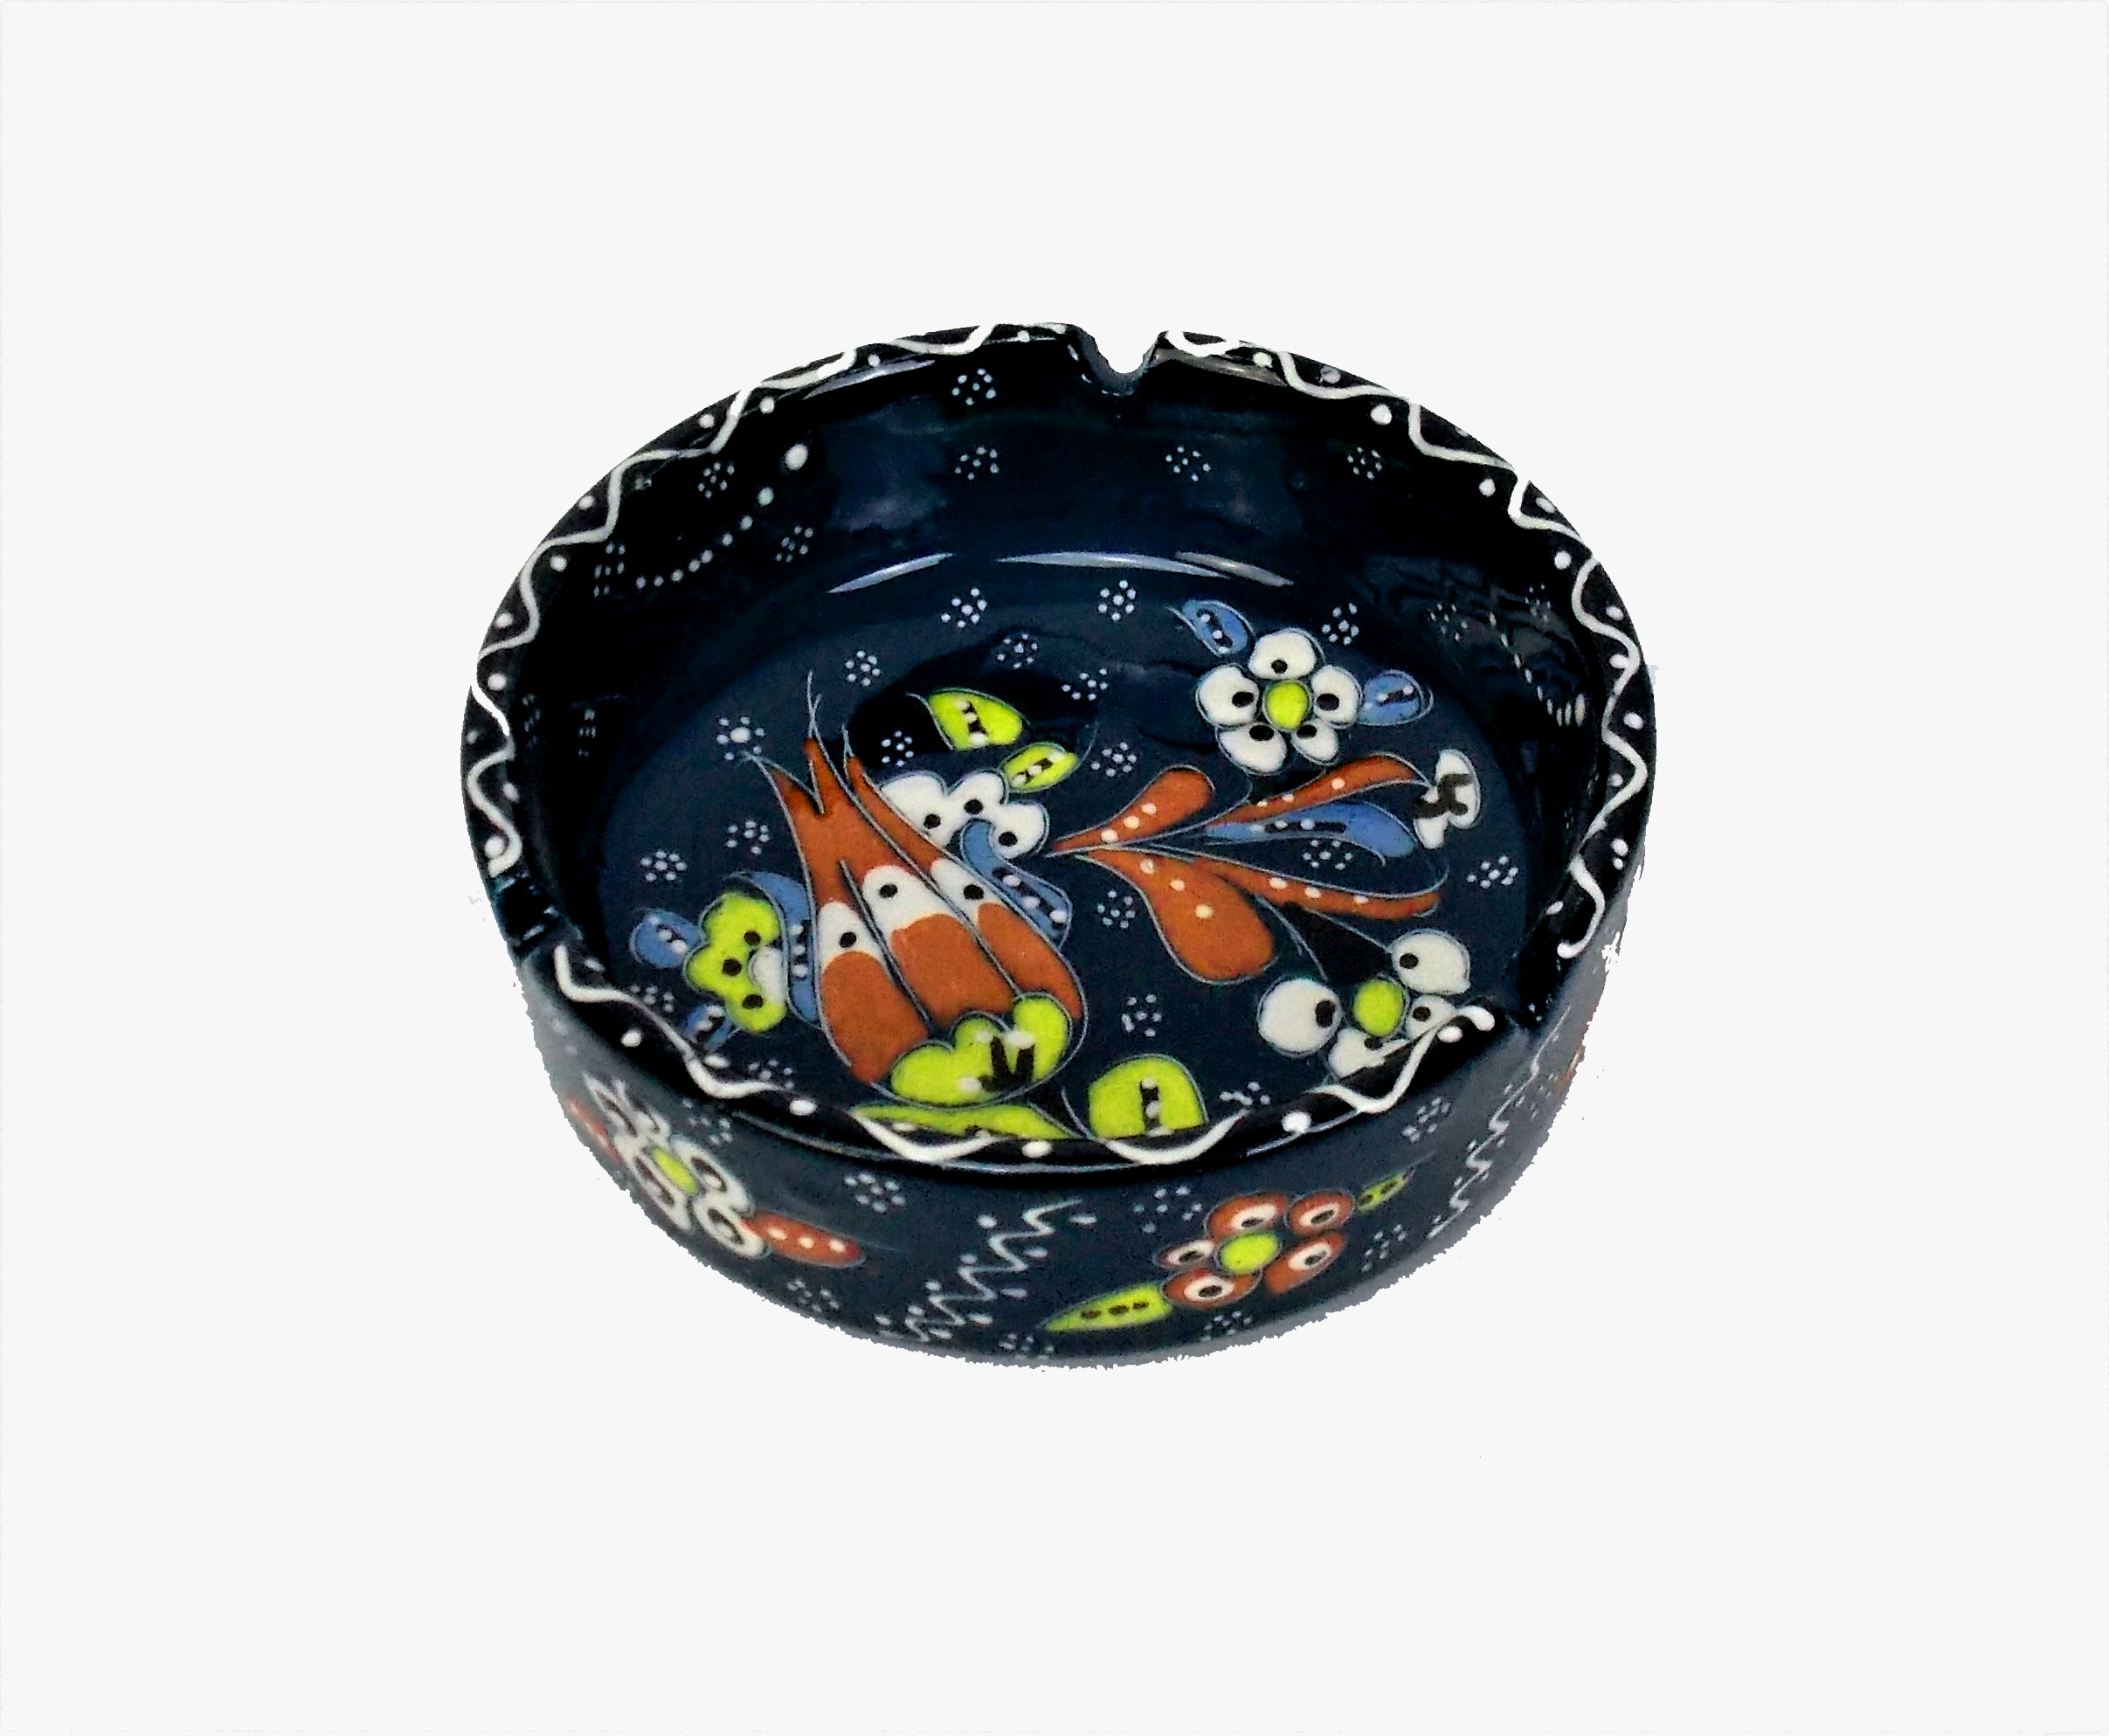 Scrumiera din ceramica turceasca - 10cm diverse culori